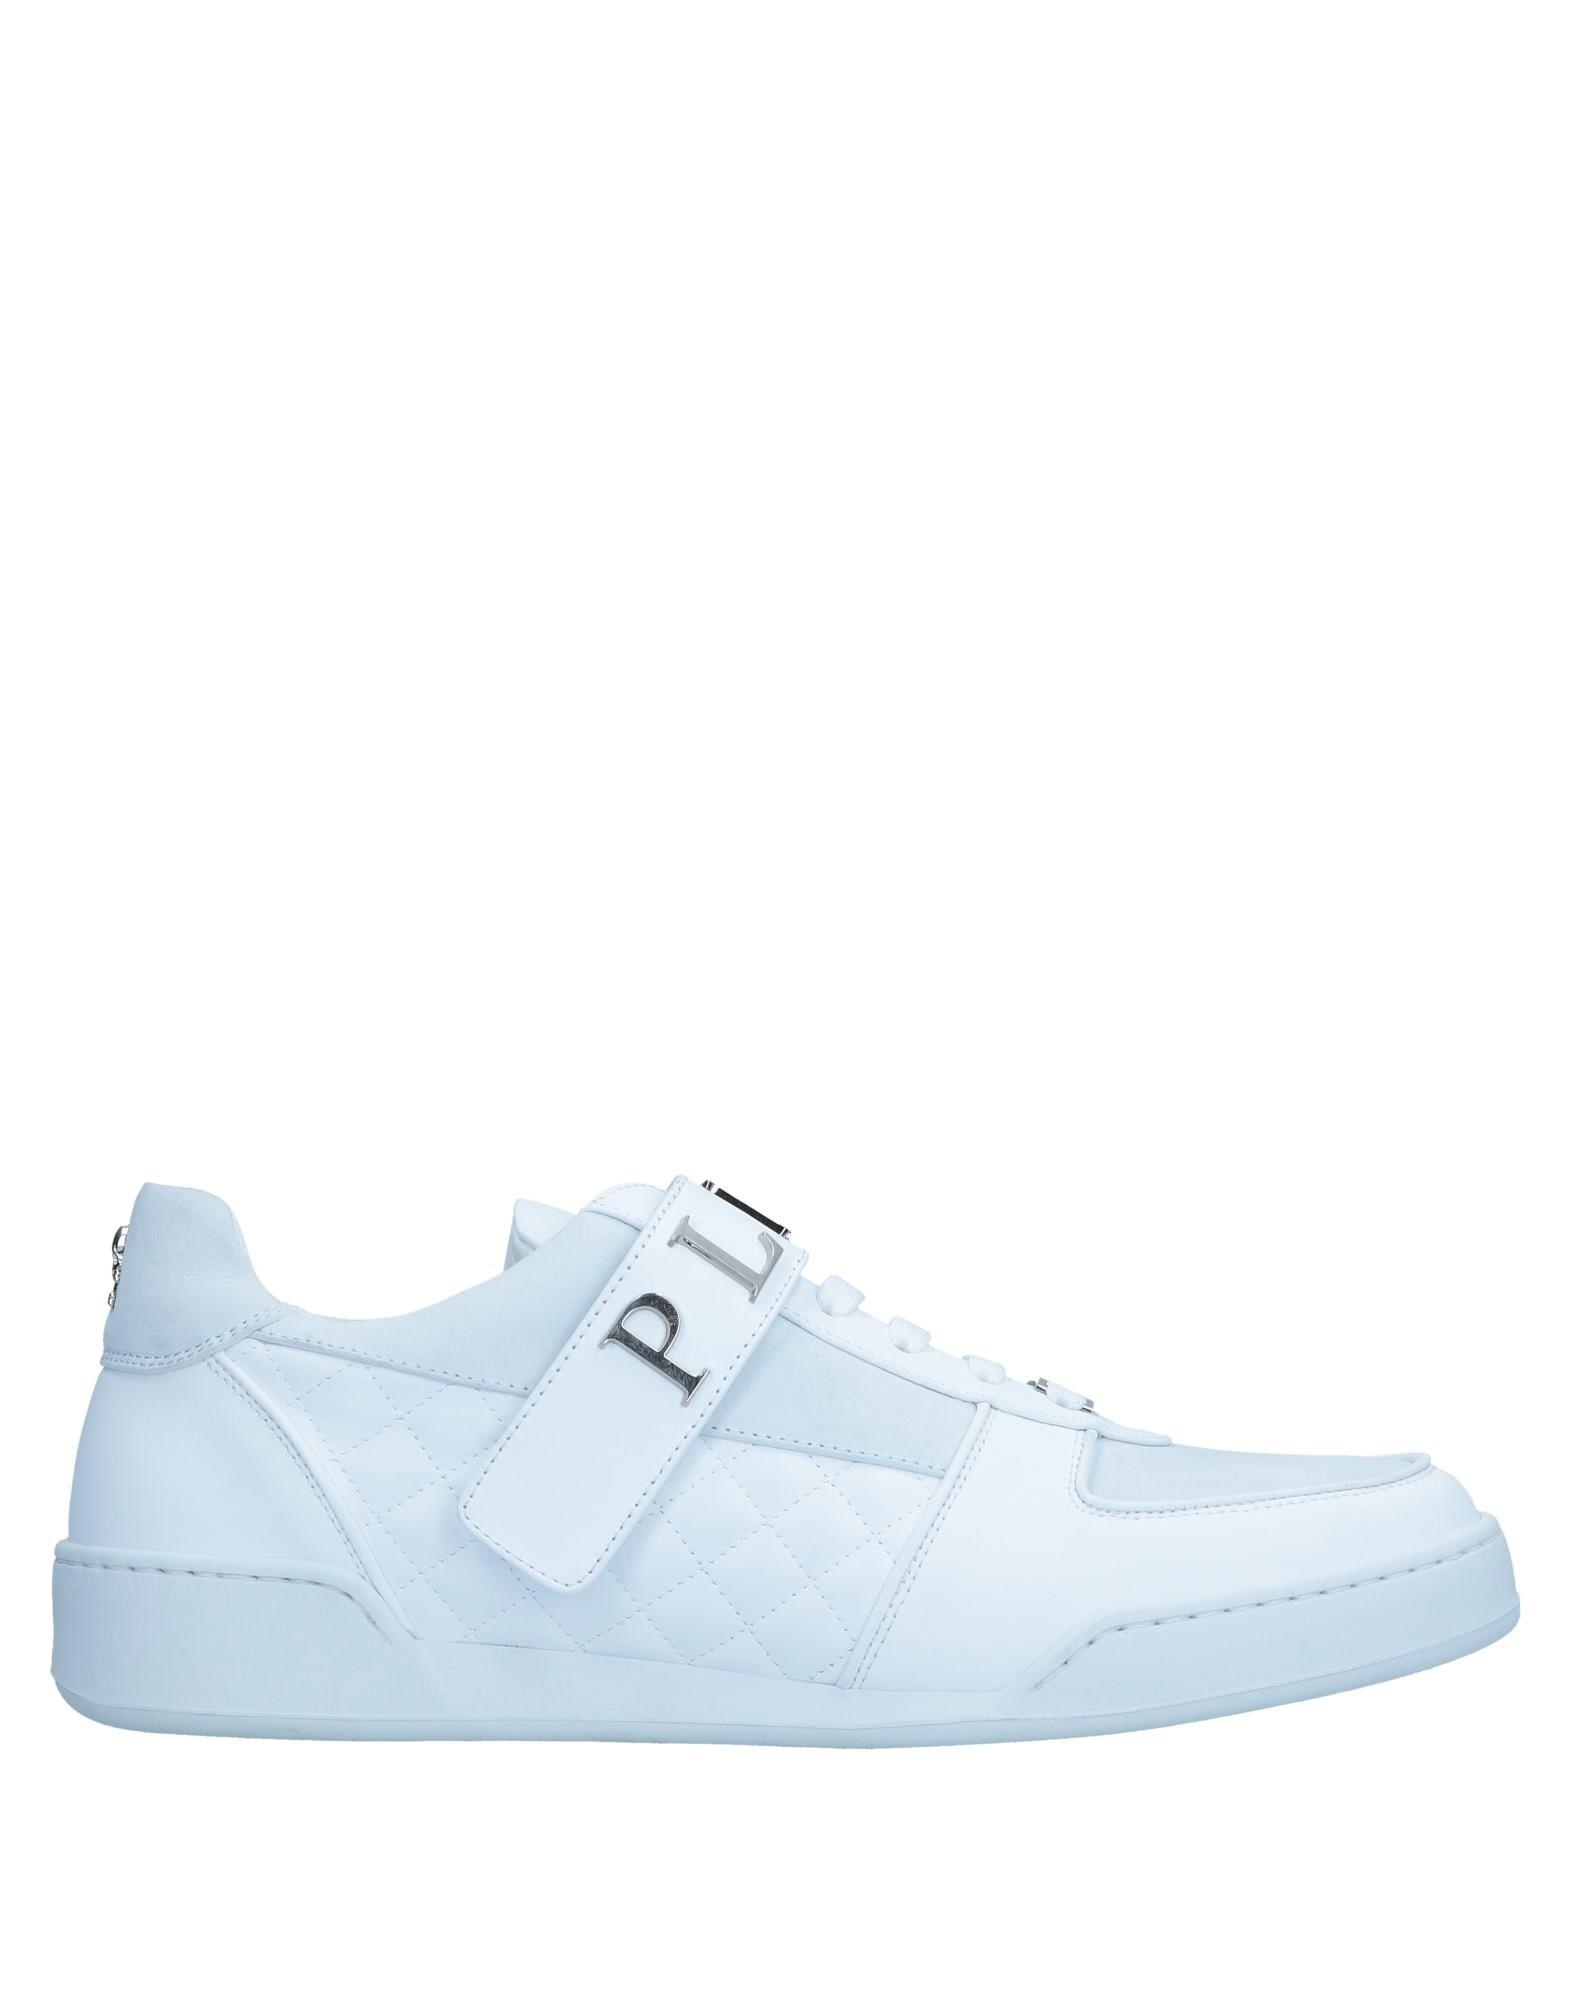 Philipp on Plein Sneakers - Men Philipp Plein Sneakers online on Philipp  Canada - 11511414LS 6bac3f